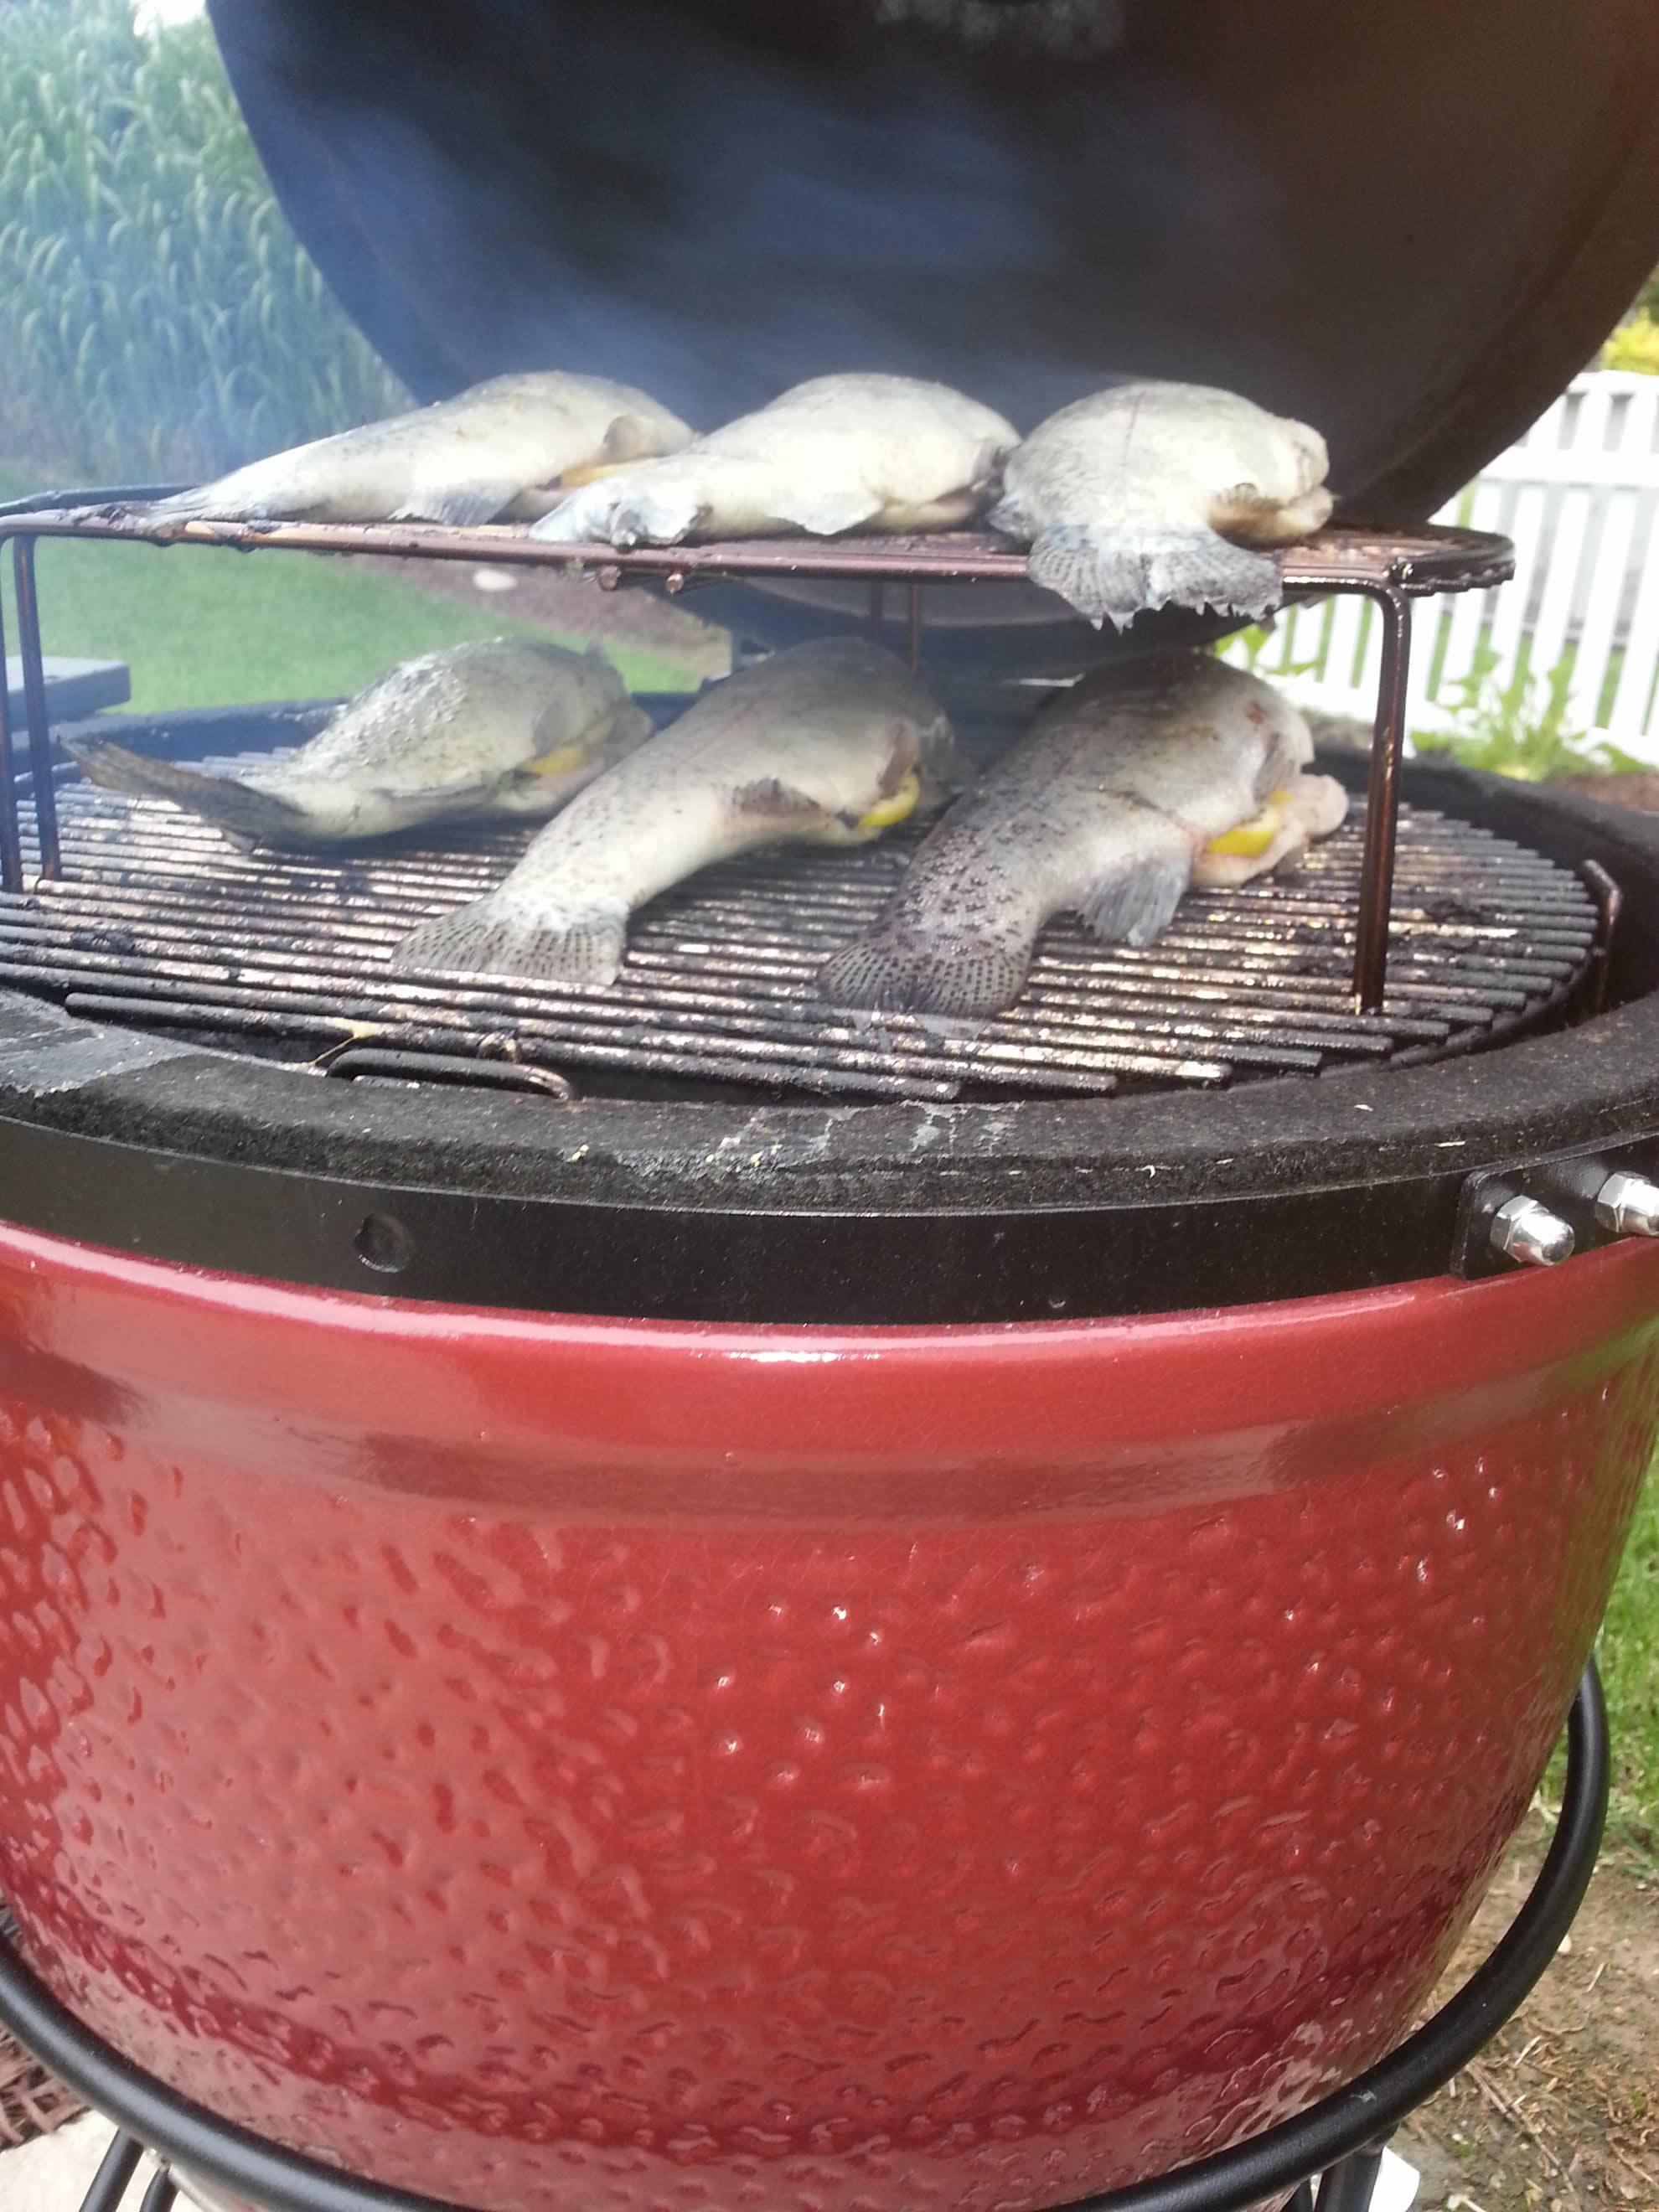 Smoked Fish In The Kamado Joe Ceramic Grill Chesterfield Mo